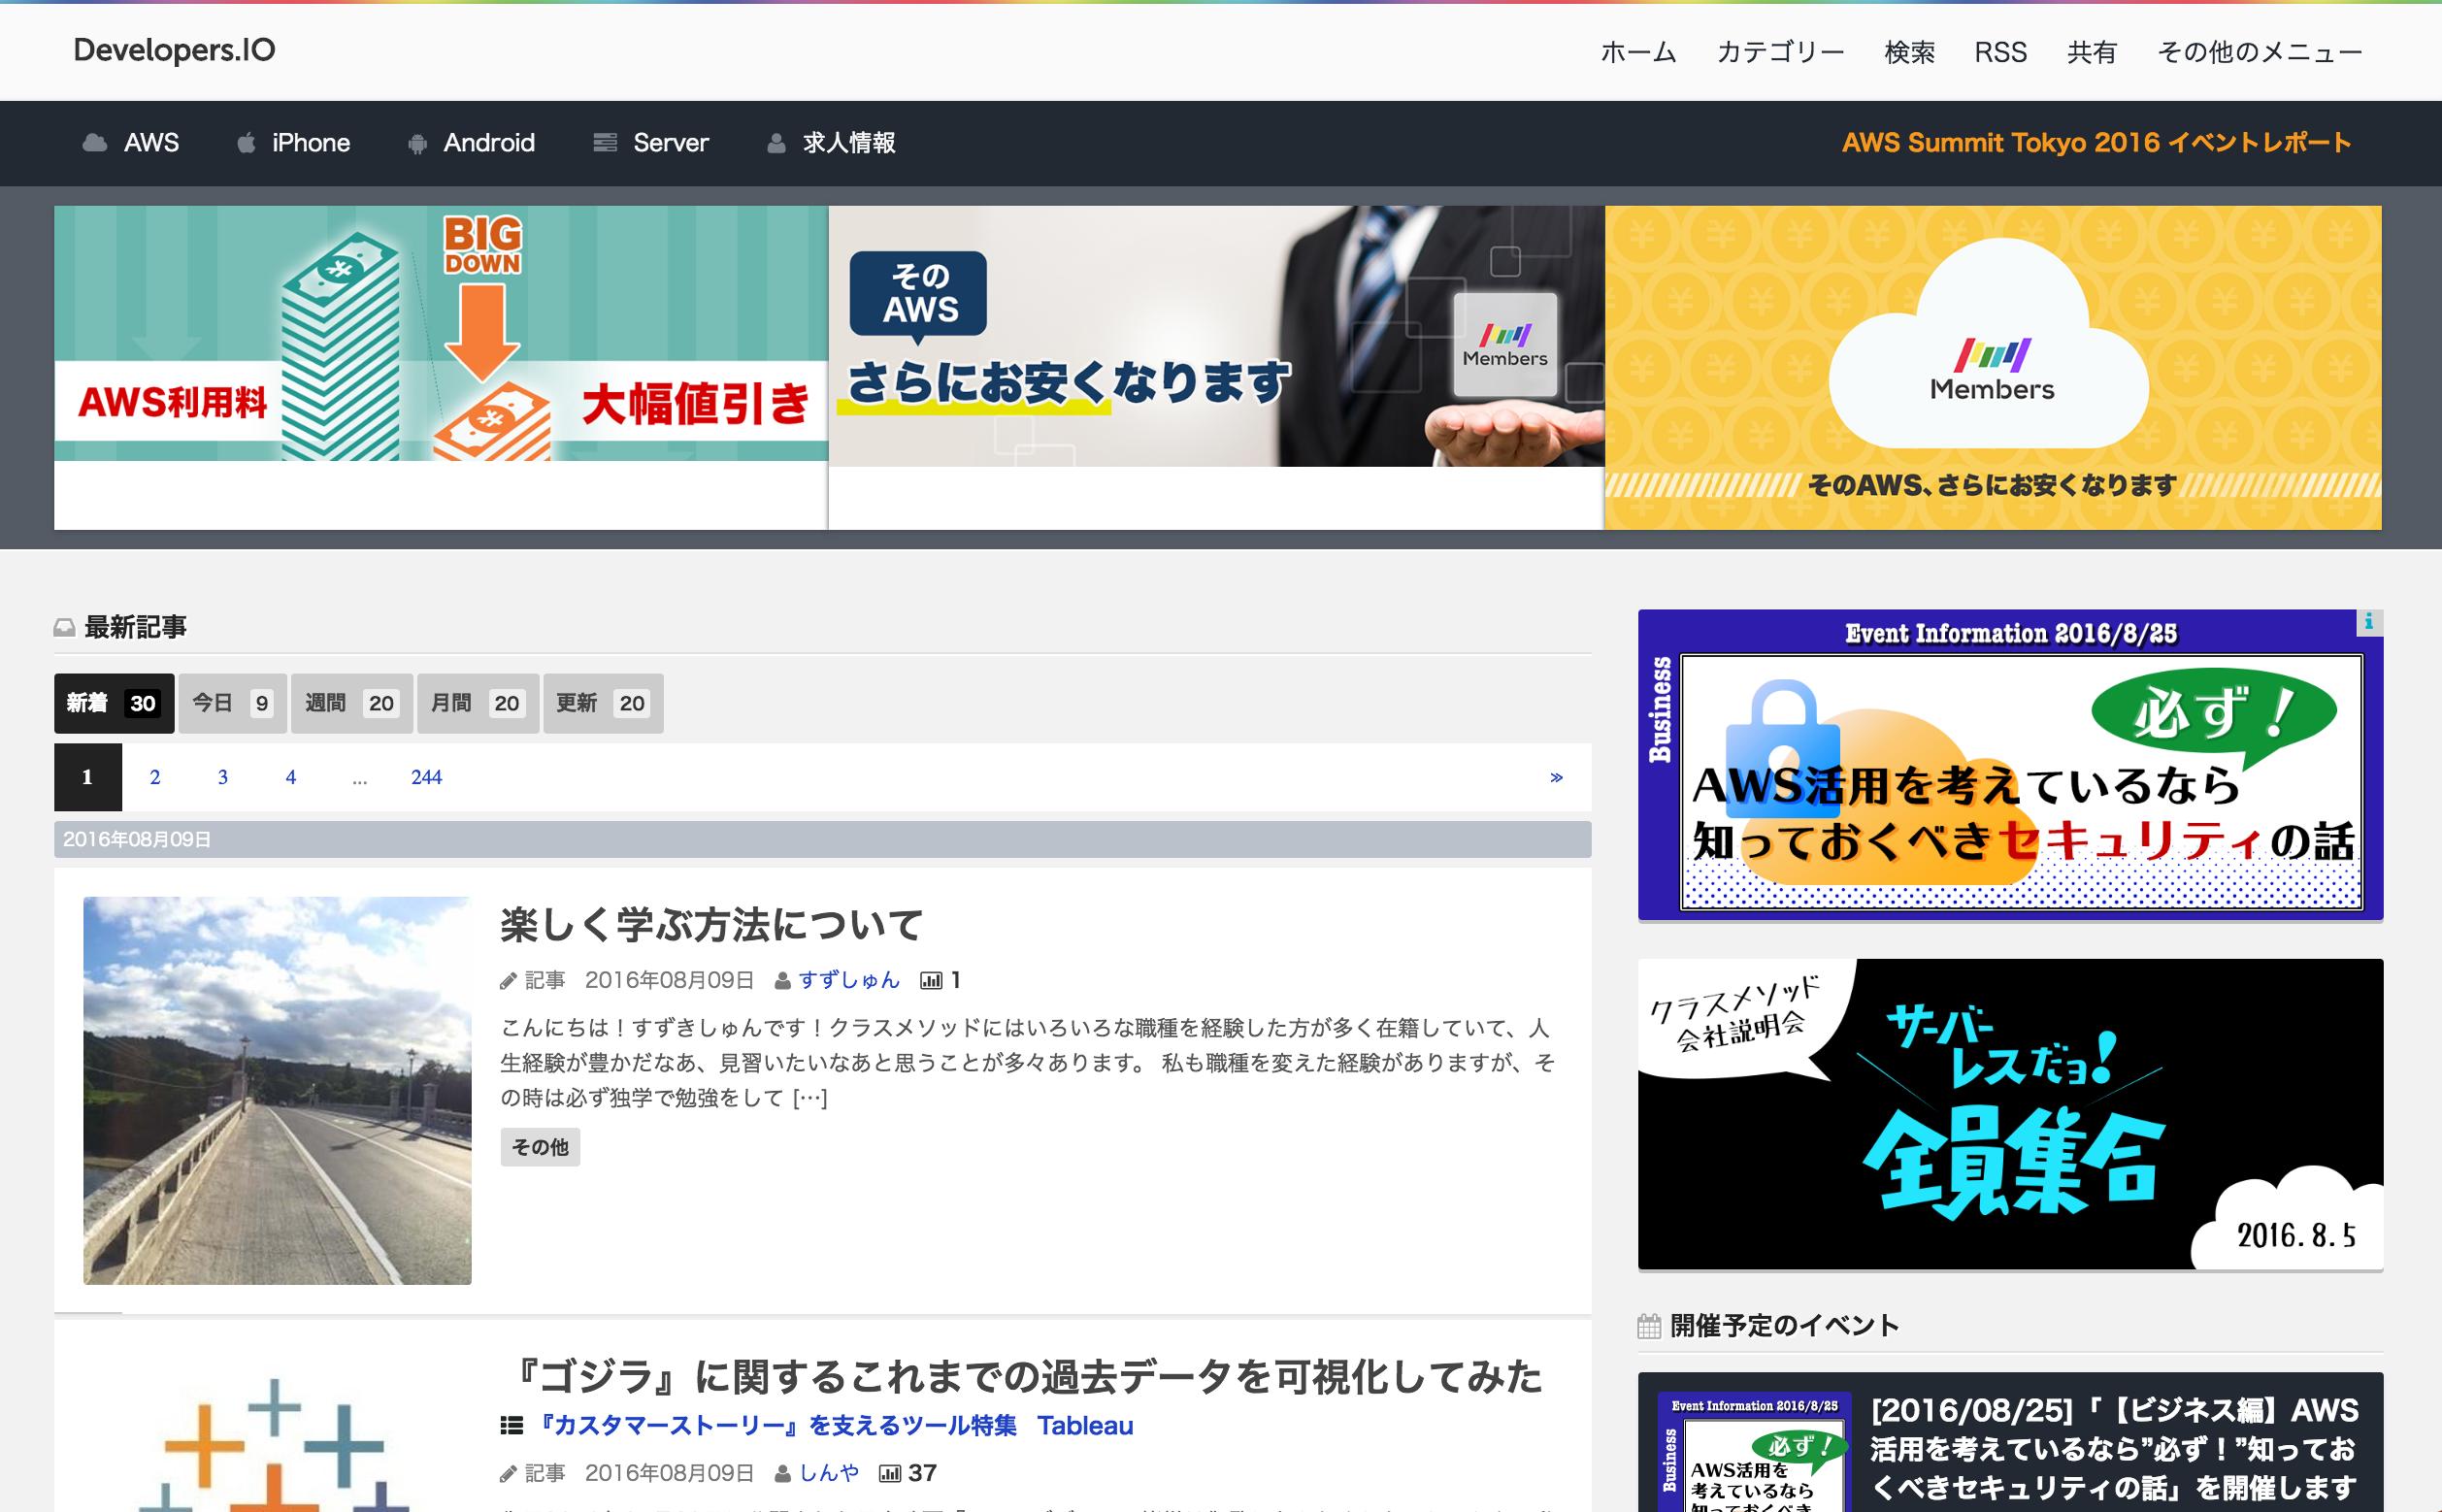 Screenshot 2016-08-10 03.39.22